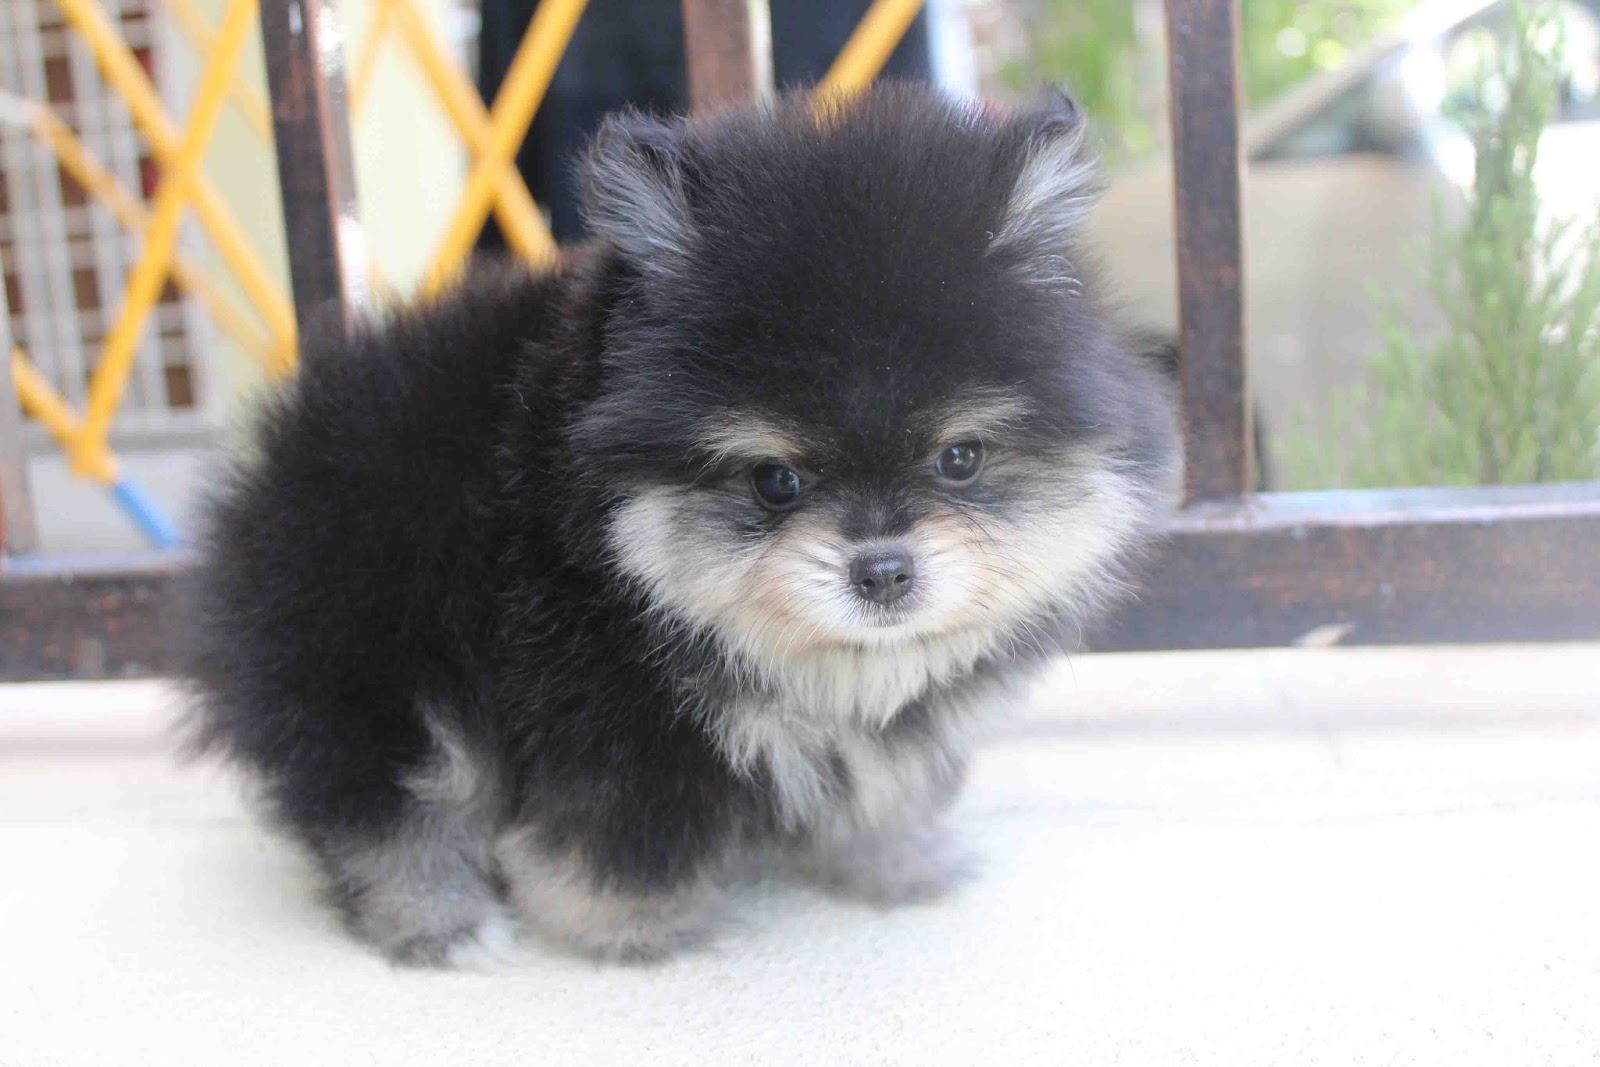 LovelyPuppy: Black Tan Super Quality Pomeranian Puppy